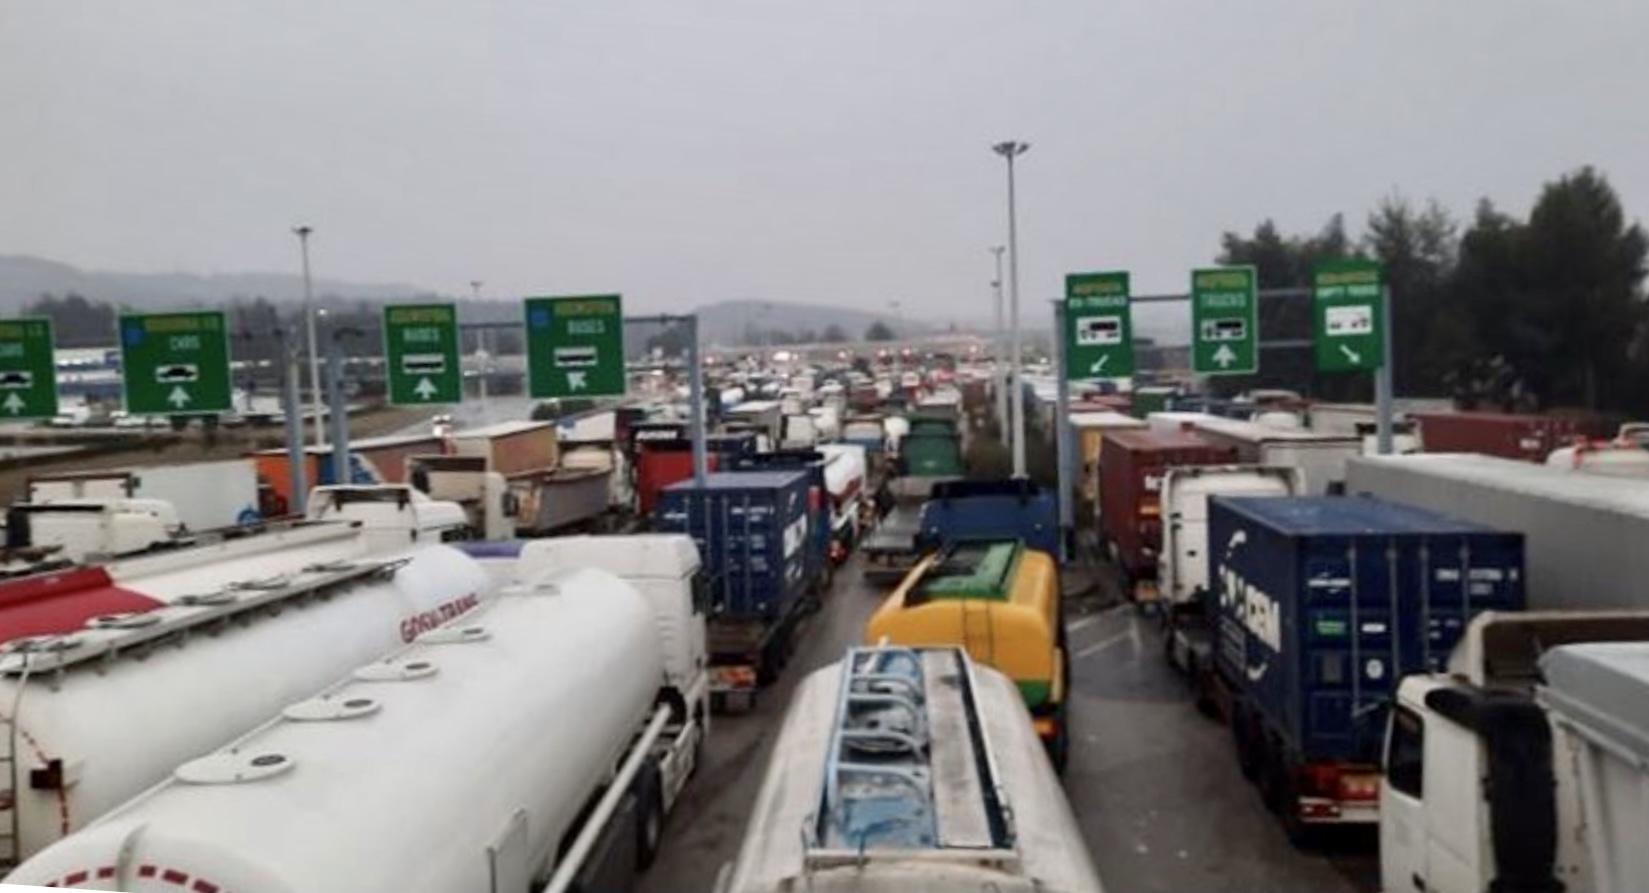 North Macedonia: Transporters facing chaos at Bogorodica-Evzoni border crossing